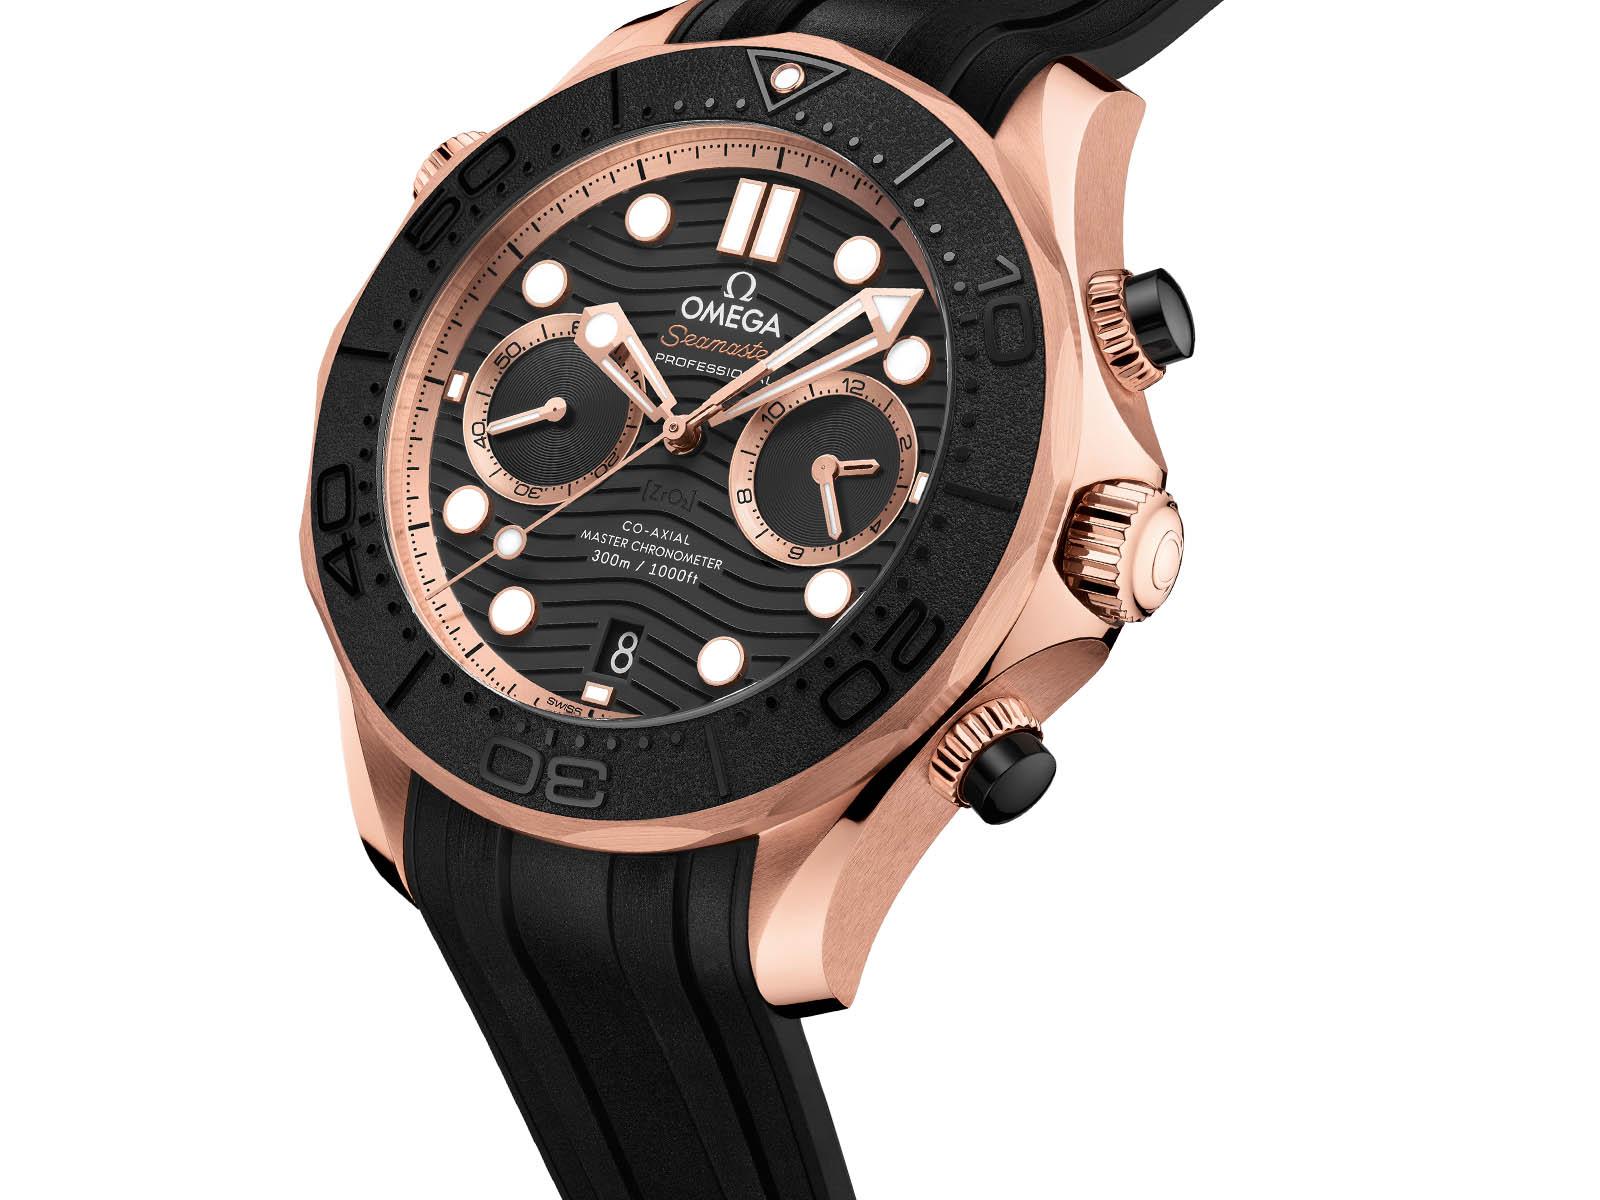 210-62-44-51-01-001-omega-seamaster-diver-300m-chronograph-2.jpg